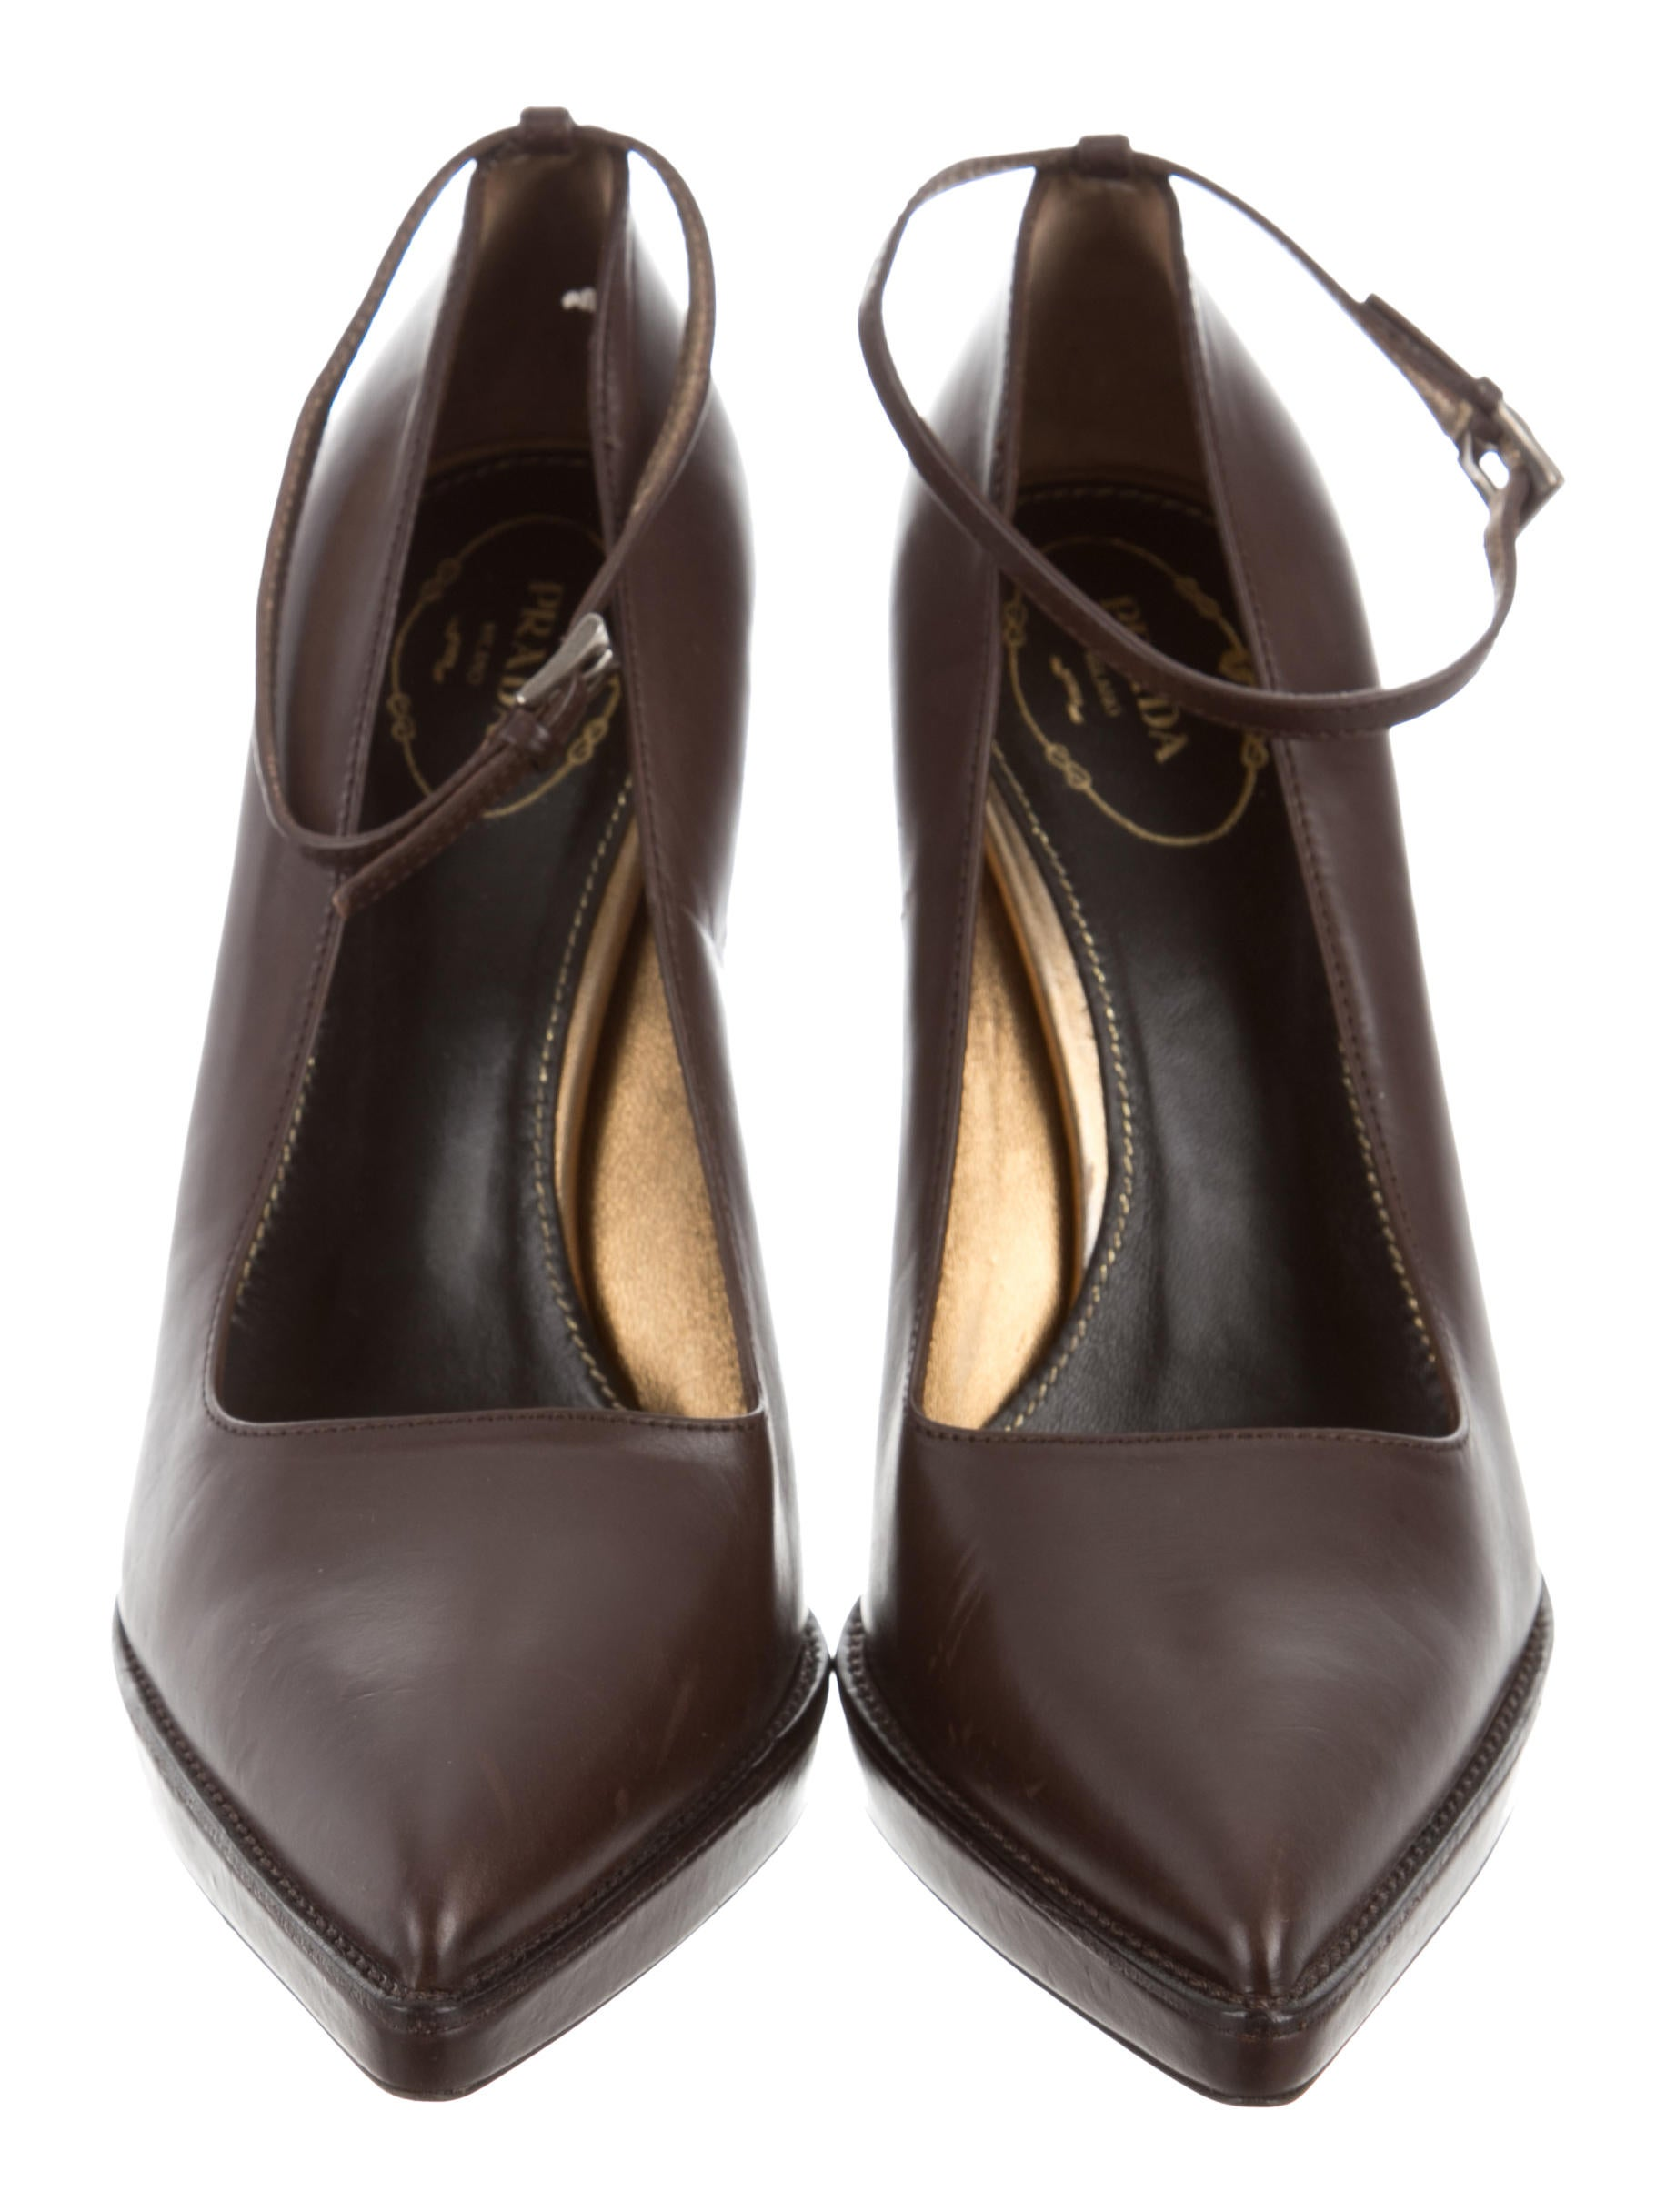 Prada Calzature Donna Leather Pumps w/ Tags cheap sale tumblr YnwYhZjZ4